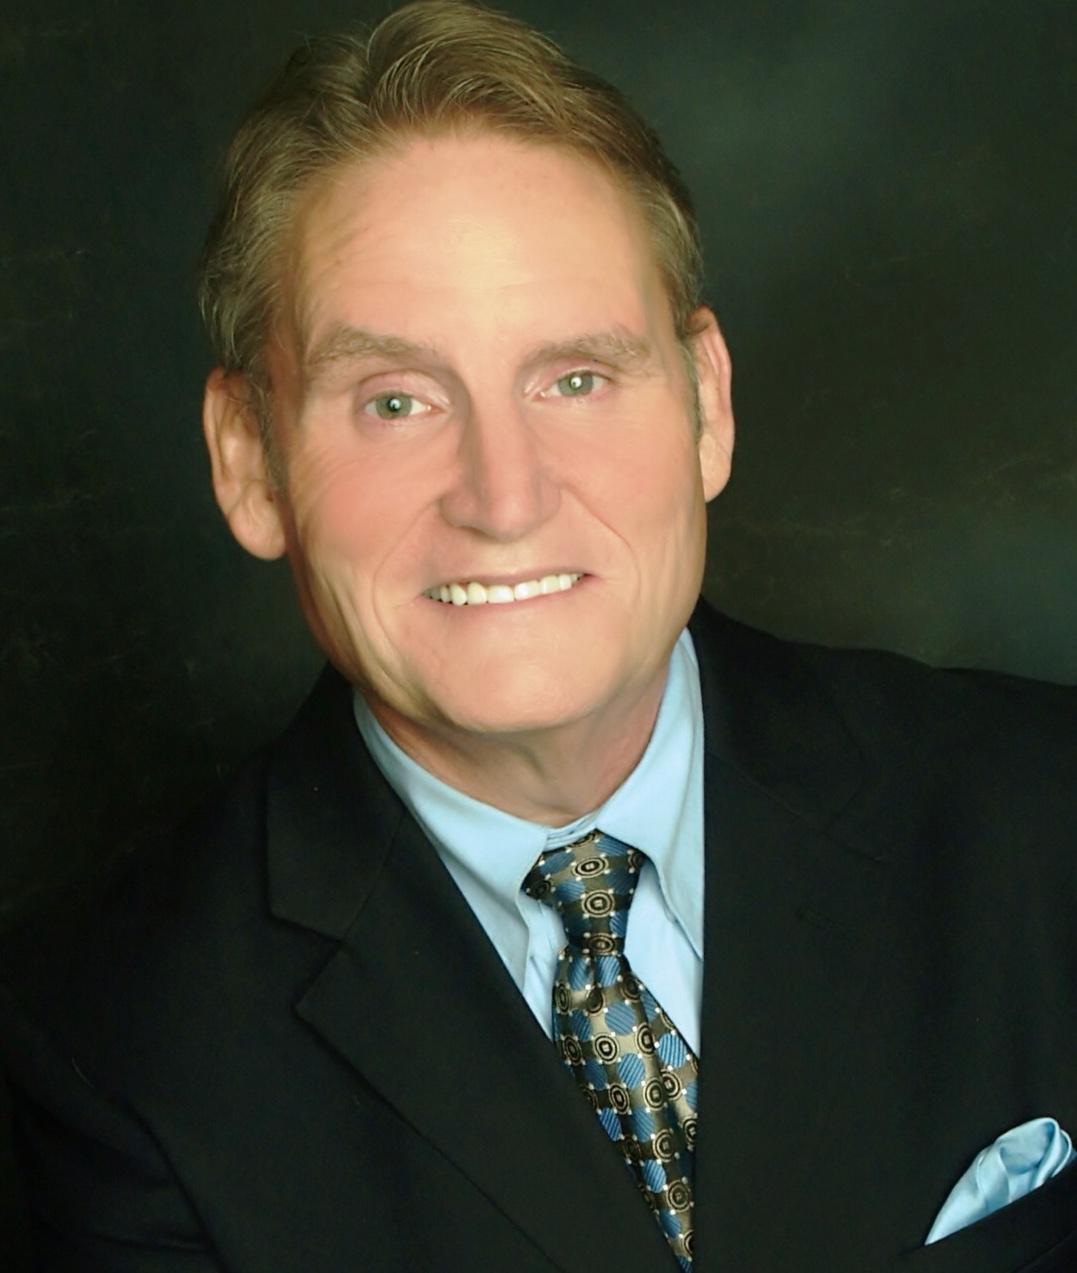 Joseph D. Storer, Managing Director, Echo Consulting Group LLC